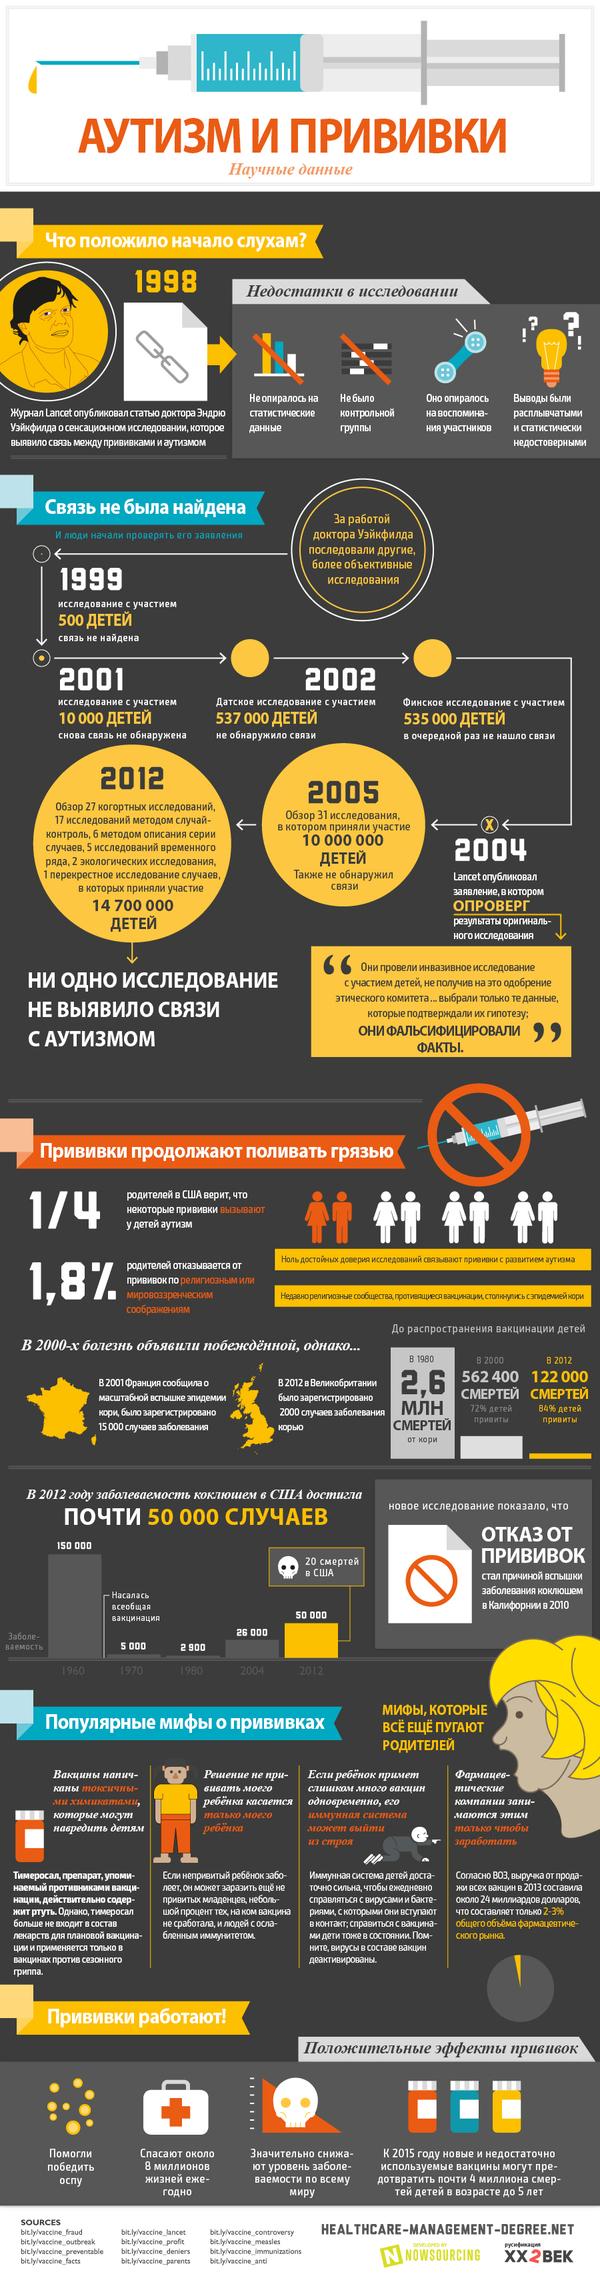 Инфографика про миф о связи прививок и аутизма Вакцина, Медицина, Просвещение, Научпоп, Длиннопост